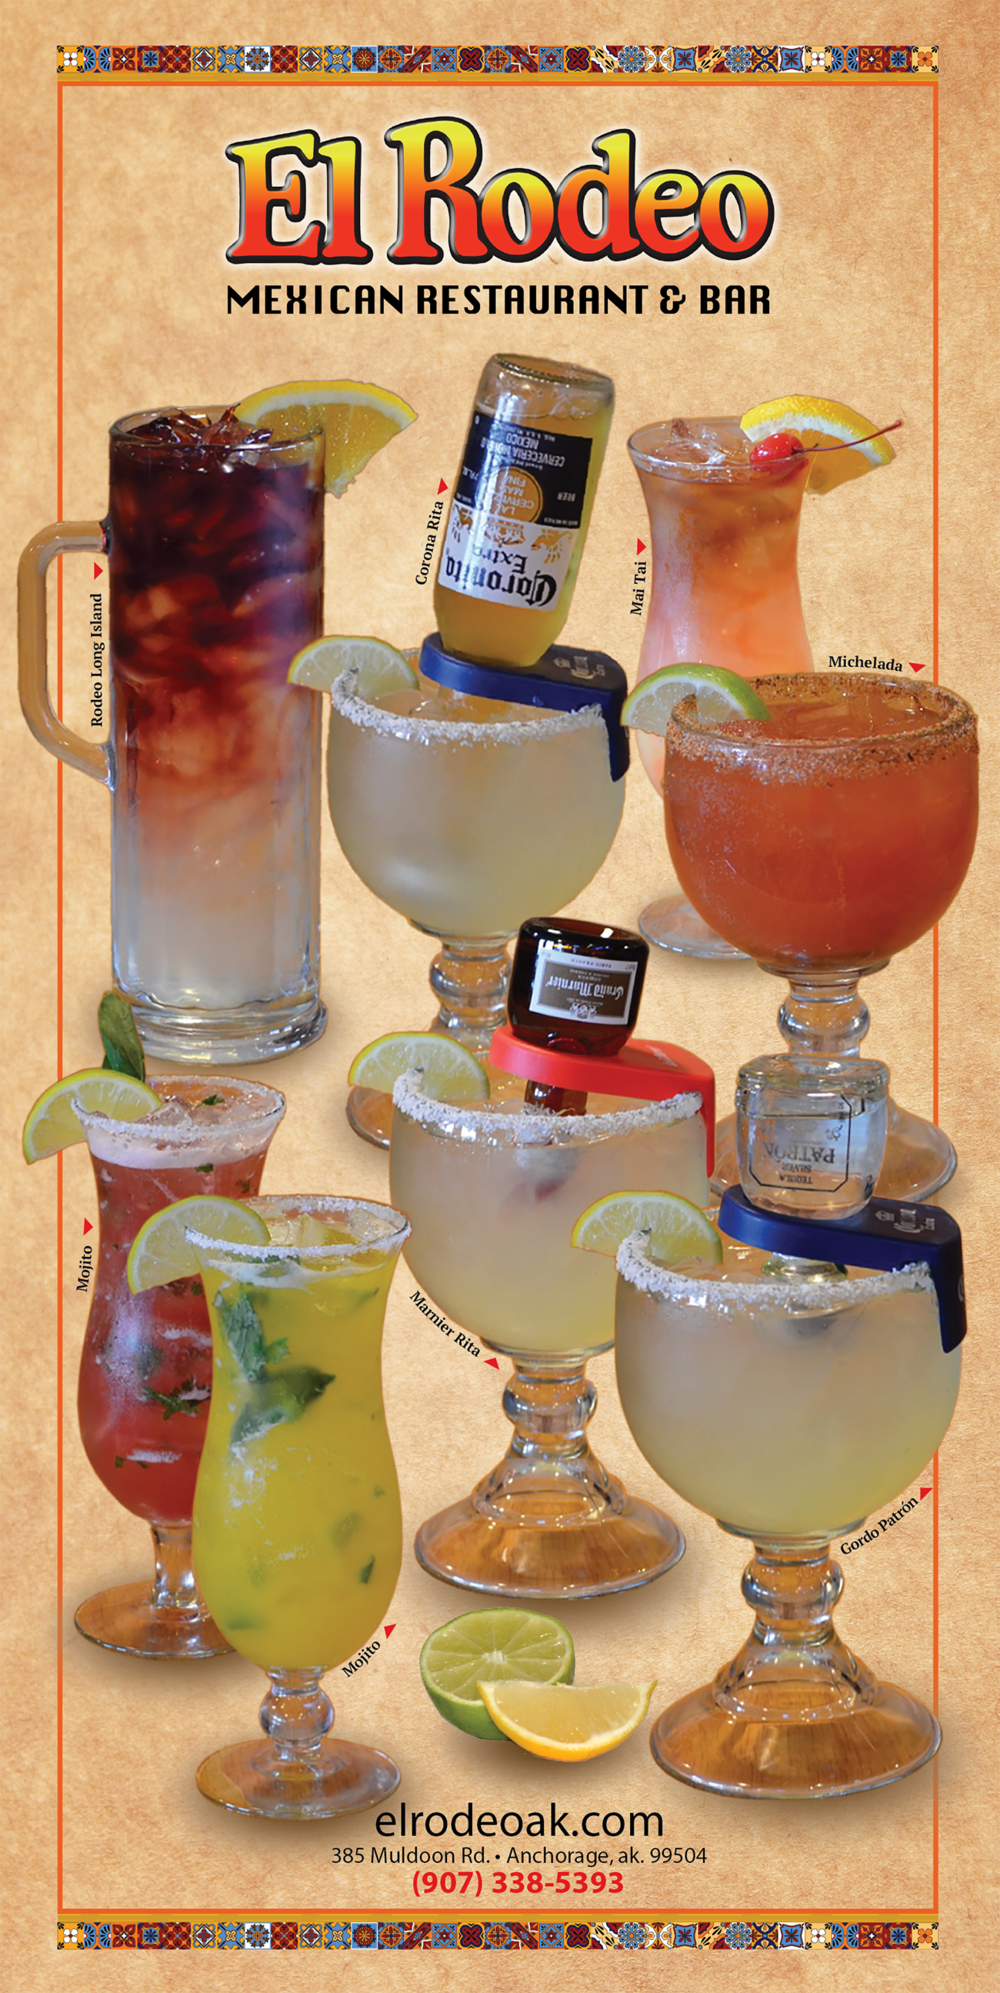 Rodeo new drinks portada 150 copy.png